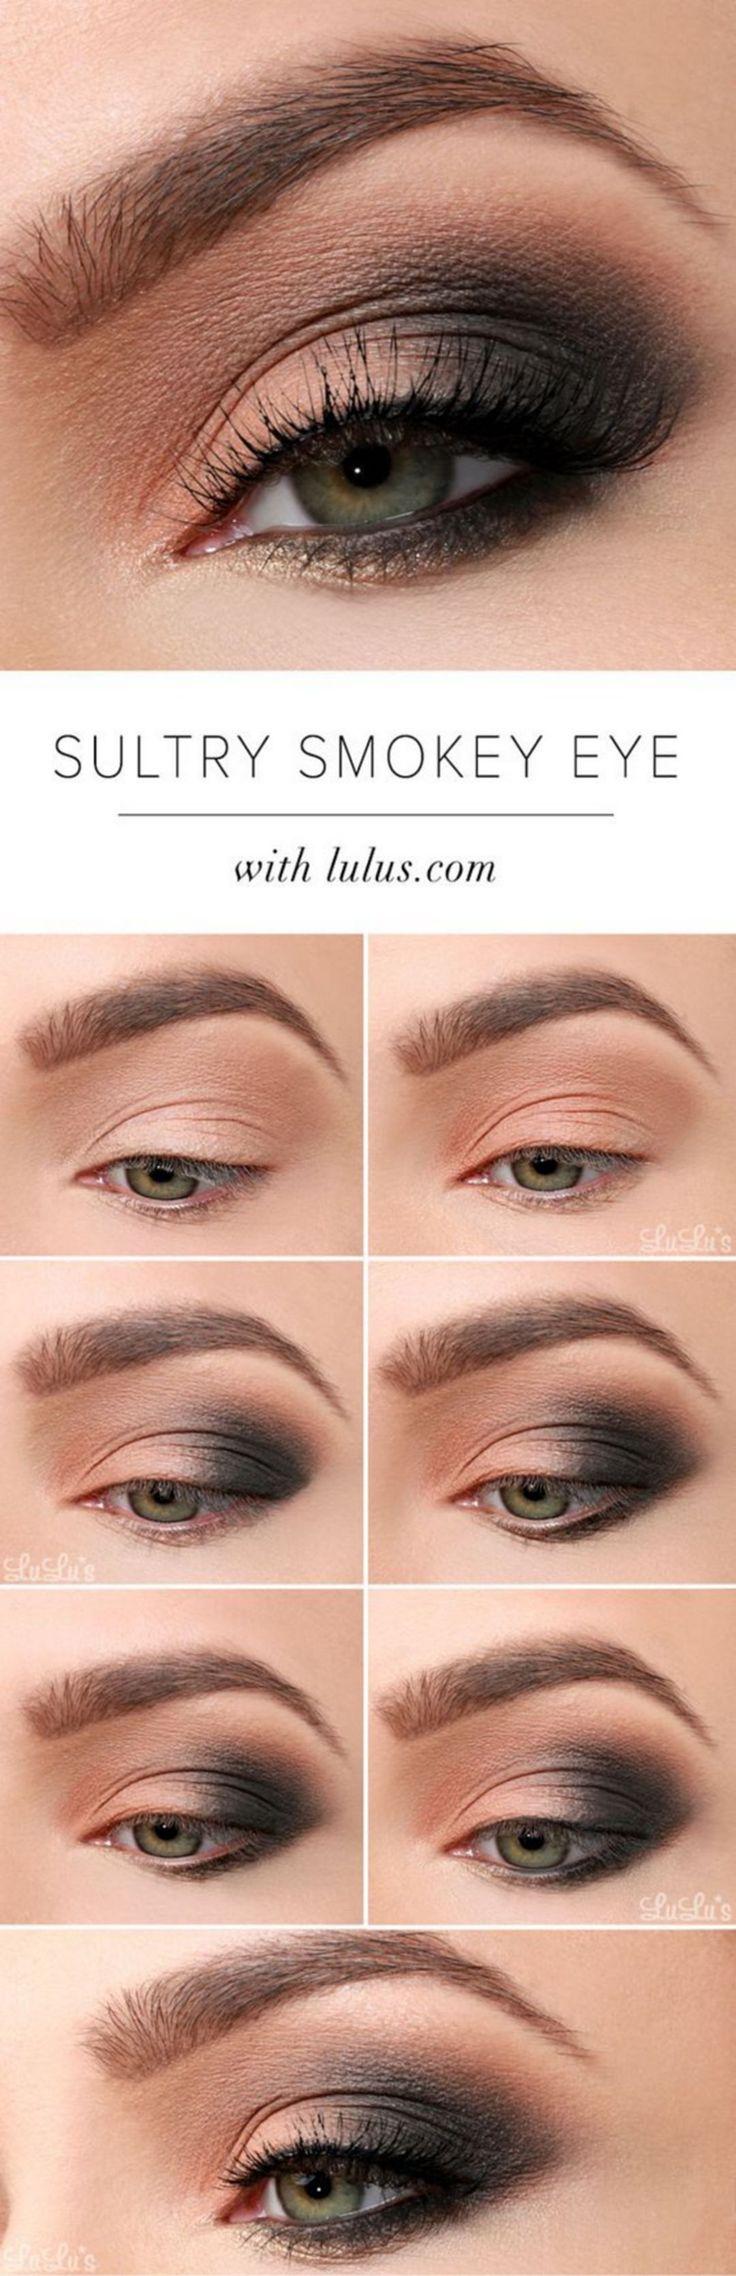 1091 best makeup tips tutorials images on pinterest make up smokey eye makeup ideas 5535 baditri Gallery